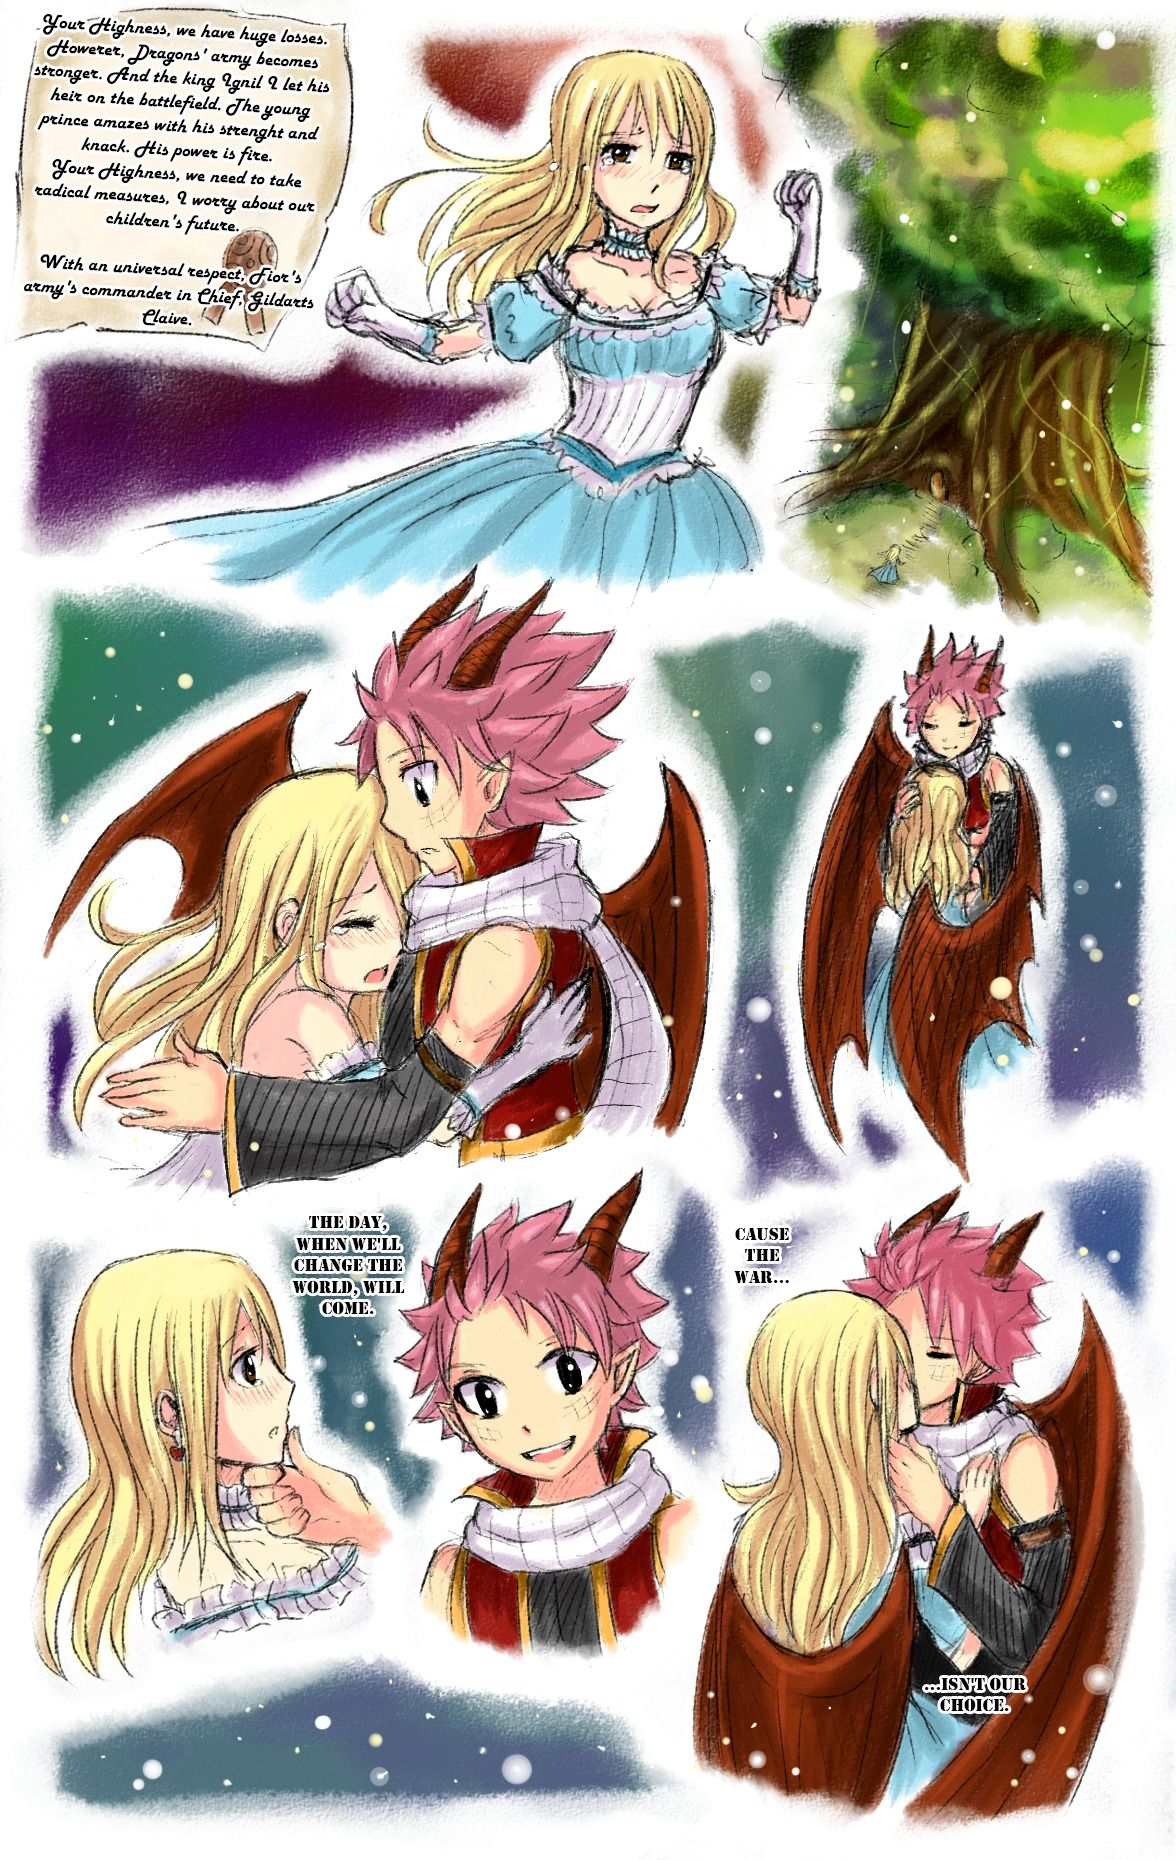 Nalu Leonstar Nalu Fairy Tail Fairy Tail Comics Fairy Tail Love